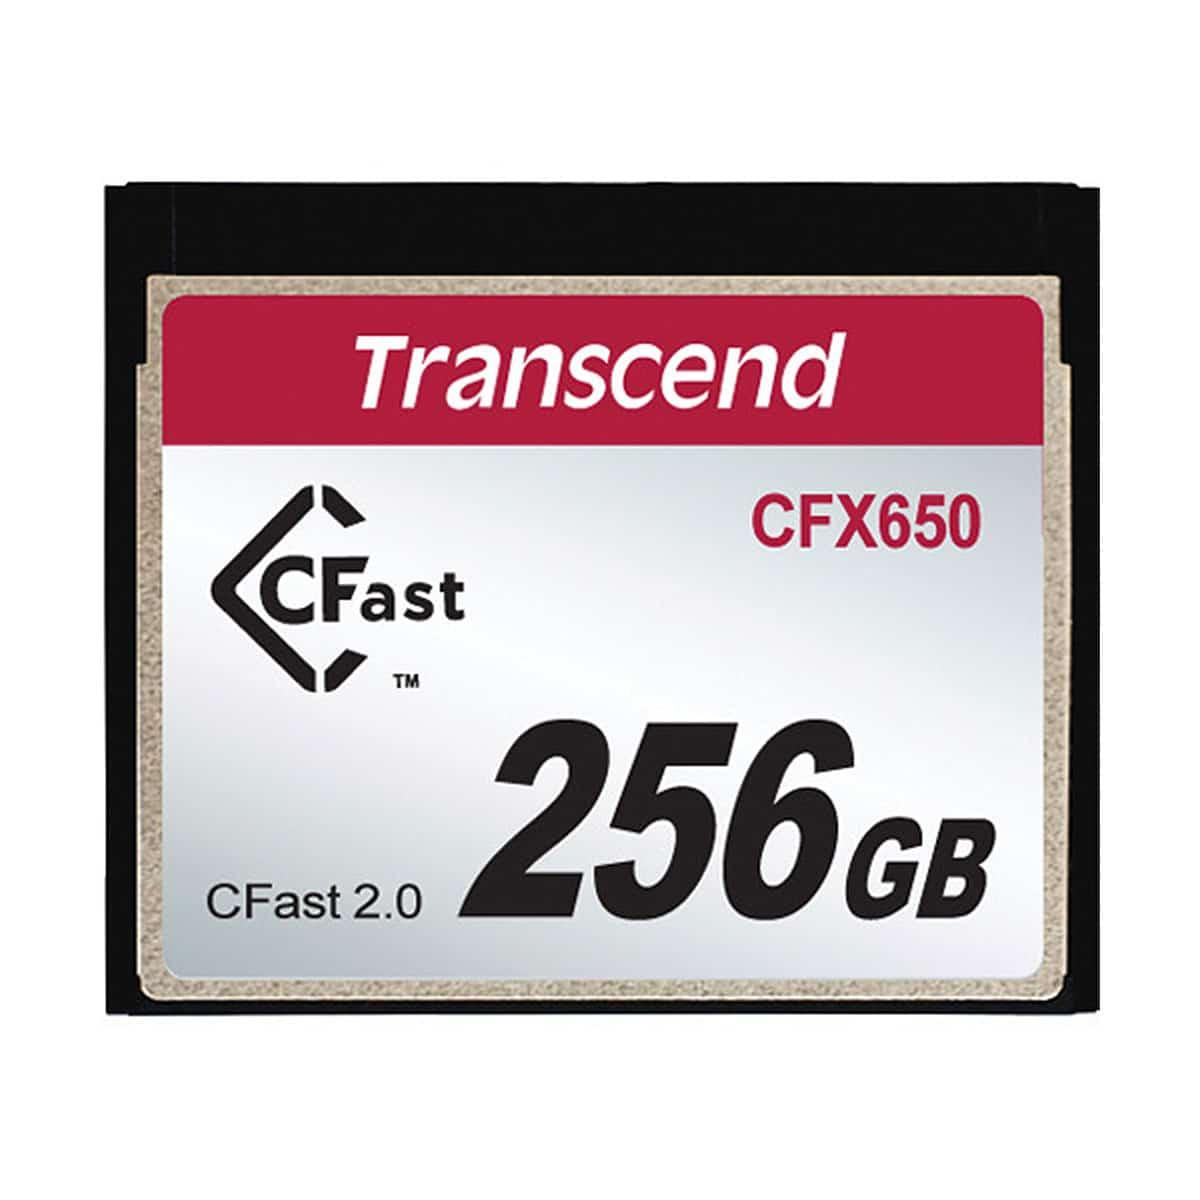 Transcend CFast 2.0 CFX650 256gb